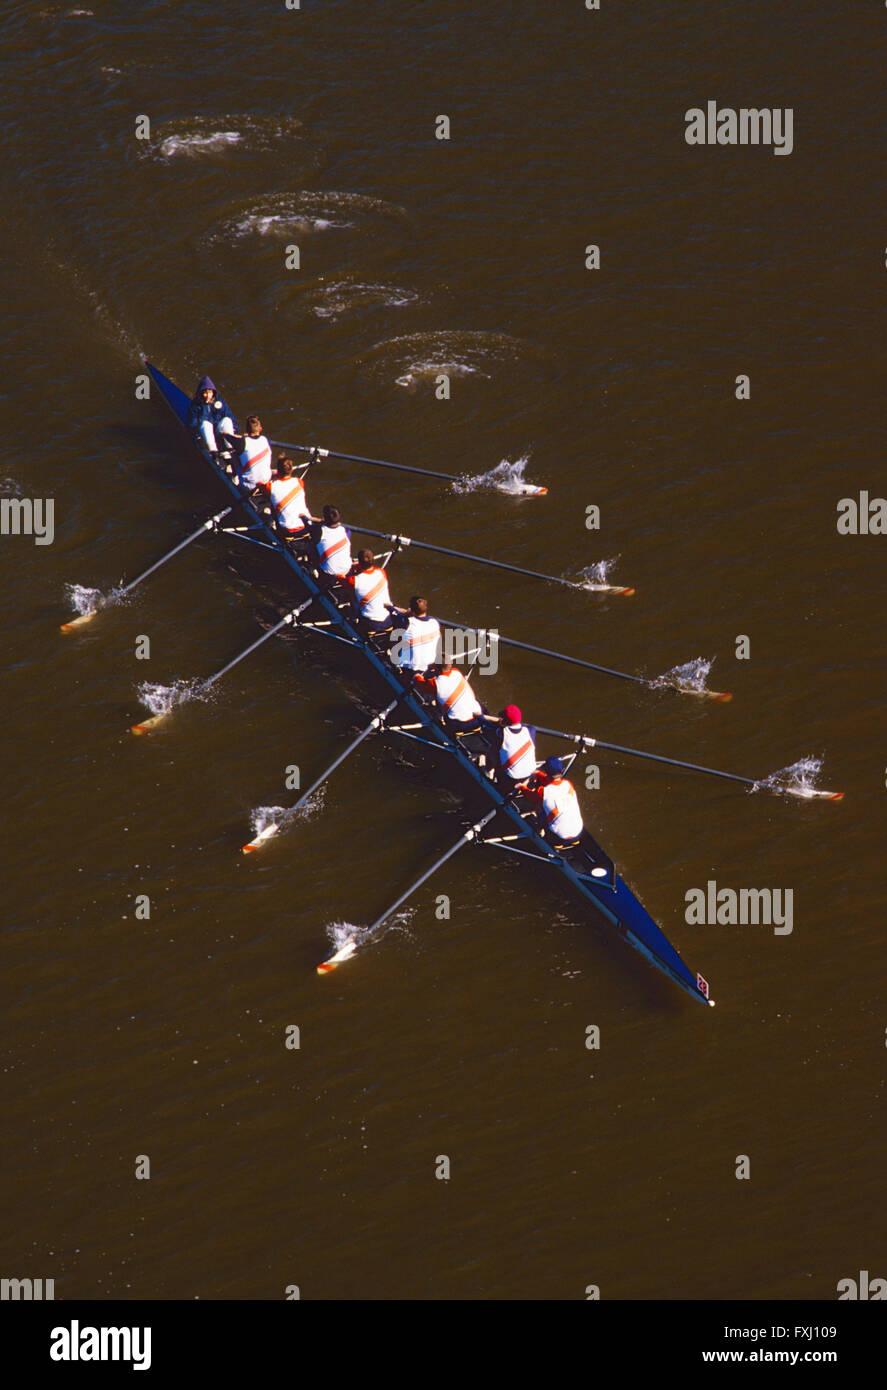 Aviron rameurs dans la tête de la Régate Schuylkill; Schuykill River; Philadelphia; Photo Stock